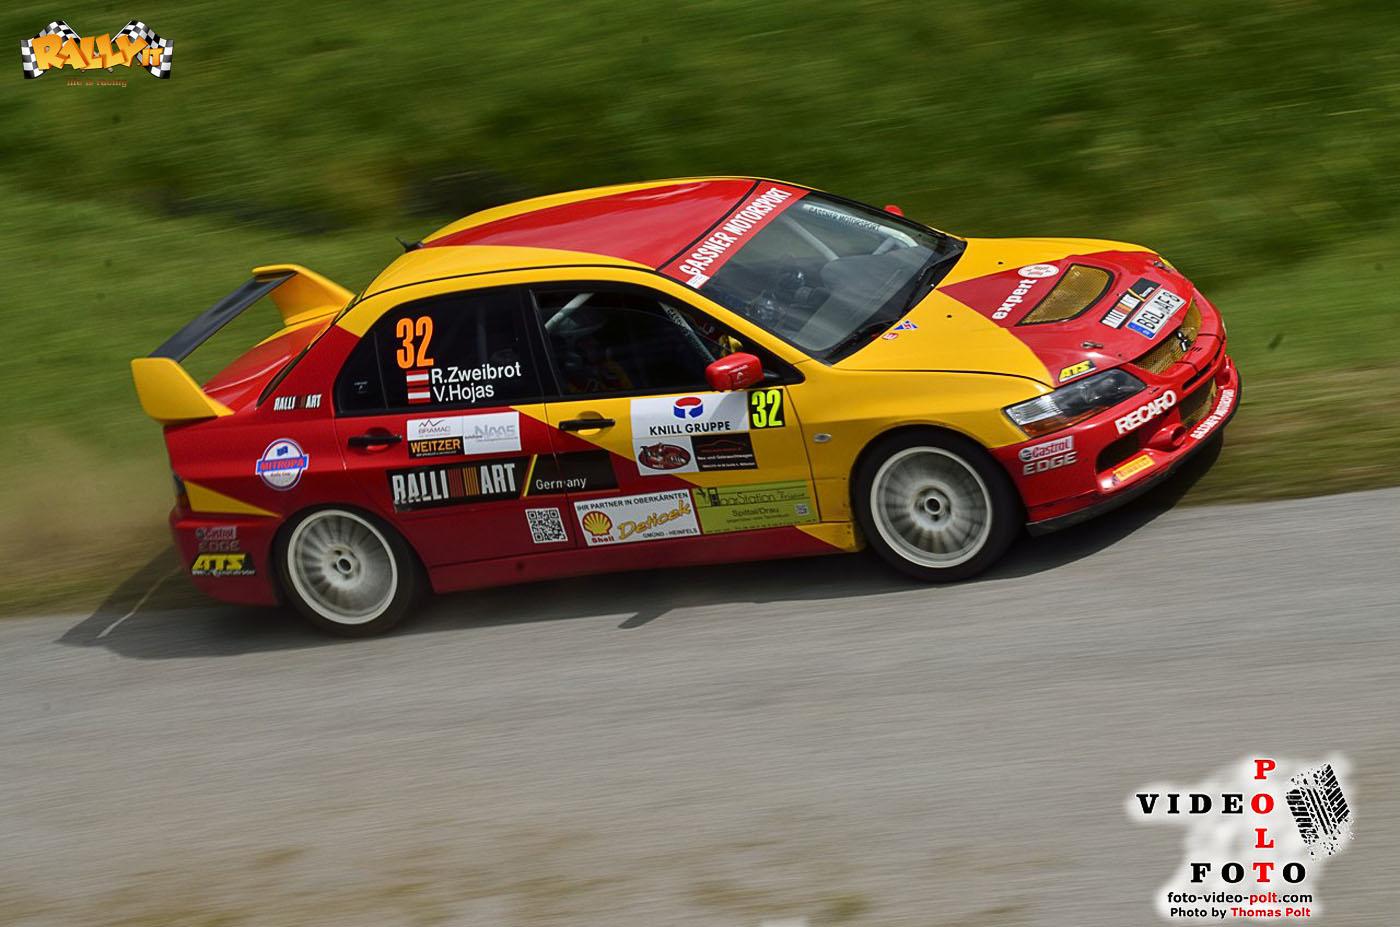 011-ORM Rallye Weiz-2014-Thomas Polt-Rally-it.jpg